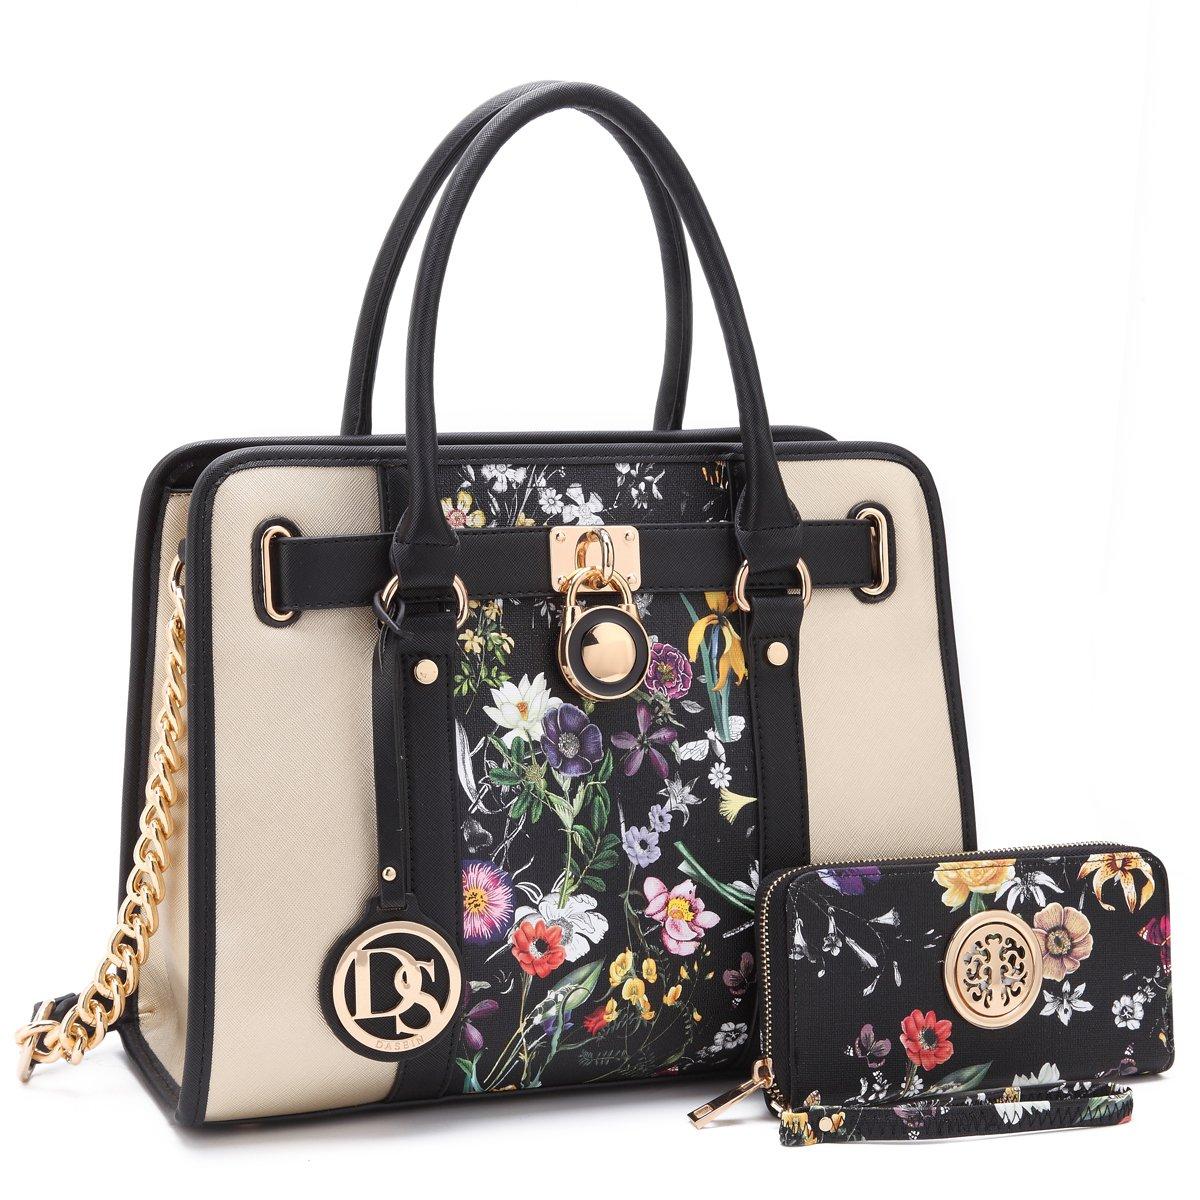 Dasein Women's Two Tone Designer Satchel Handbags Padlock Purses Shoulder Bags Work Bags w/Chain Strap